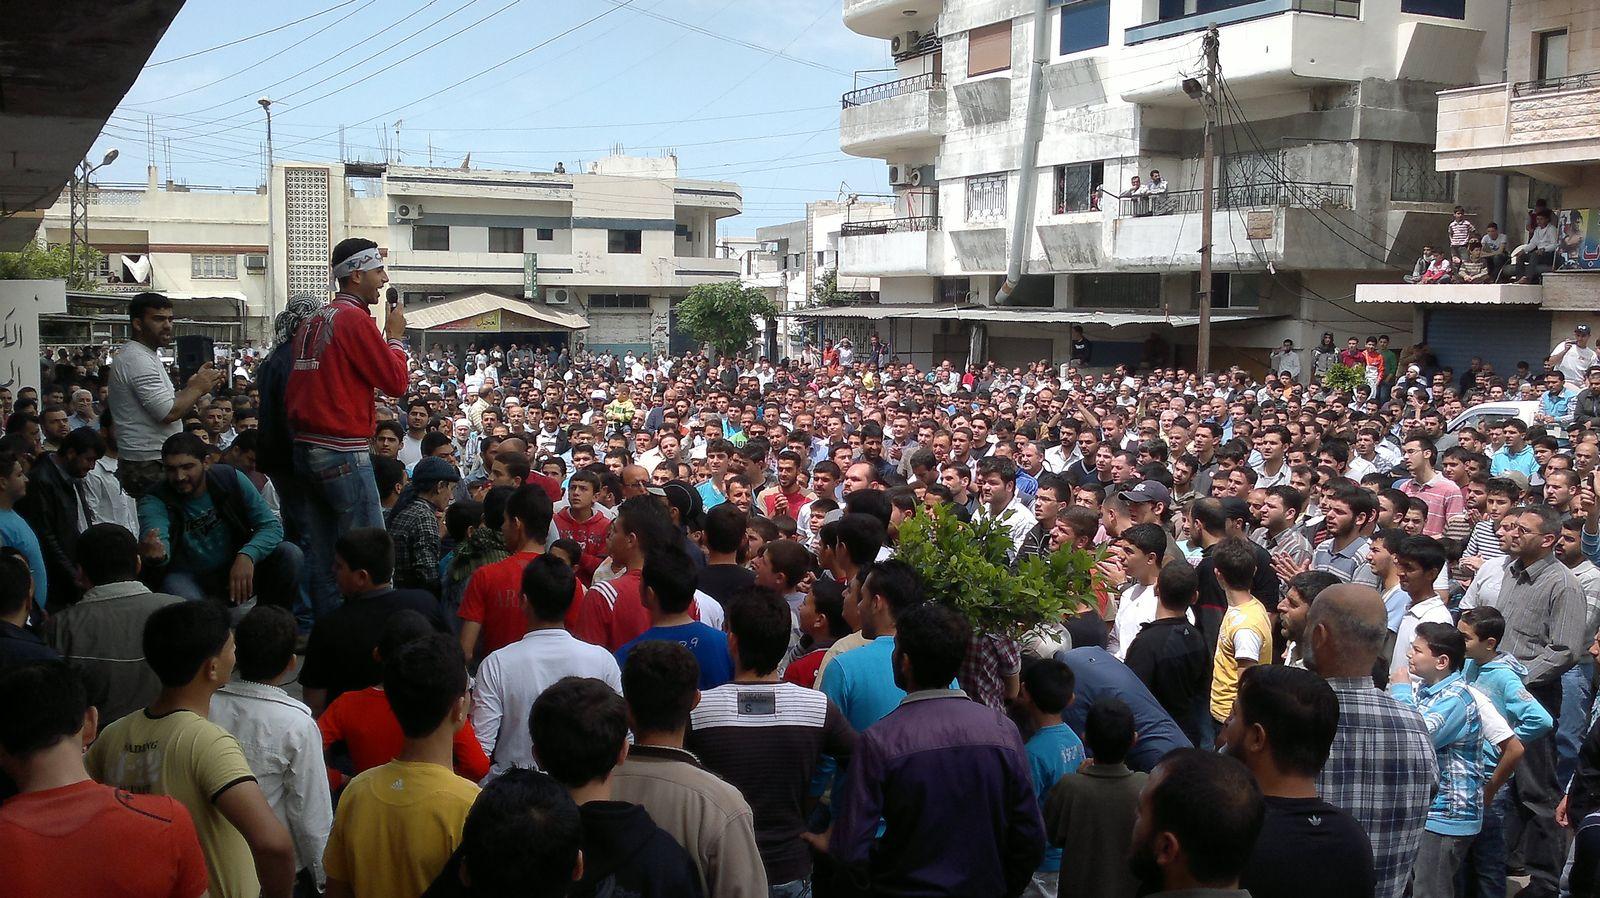 Syrien Proteste Samstag